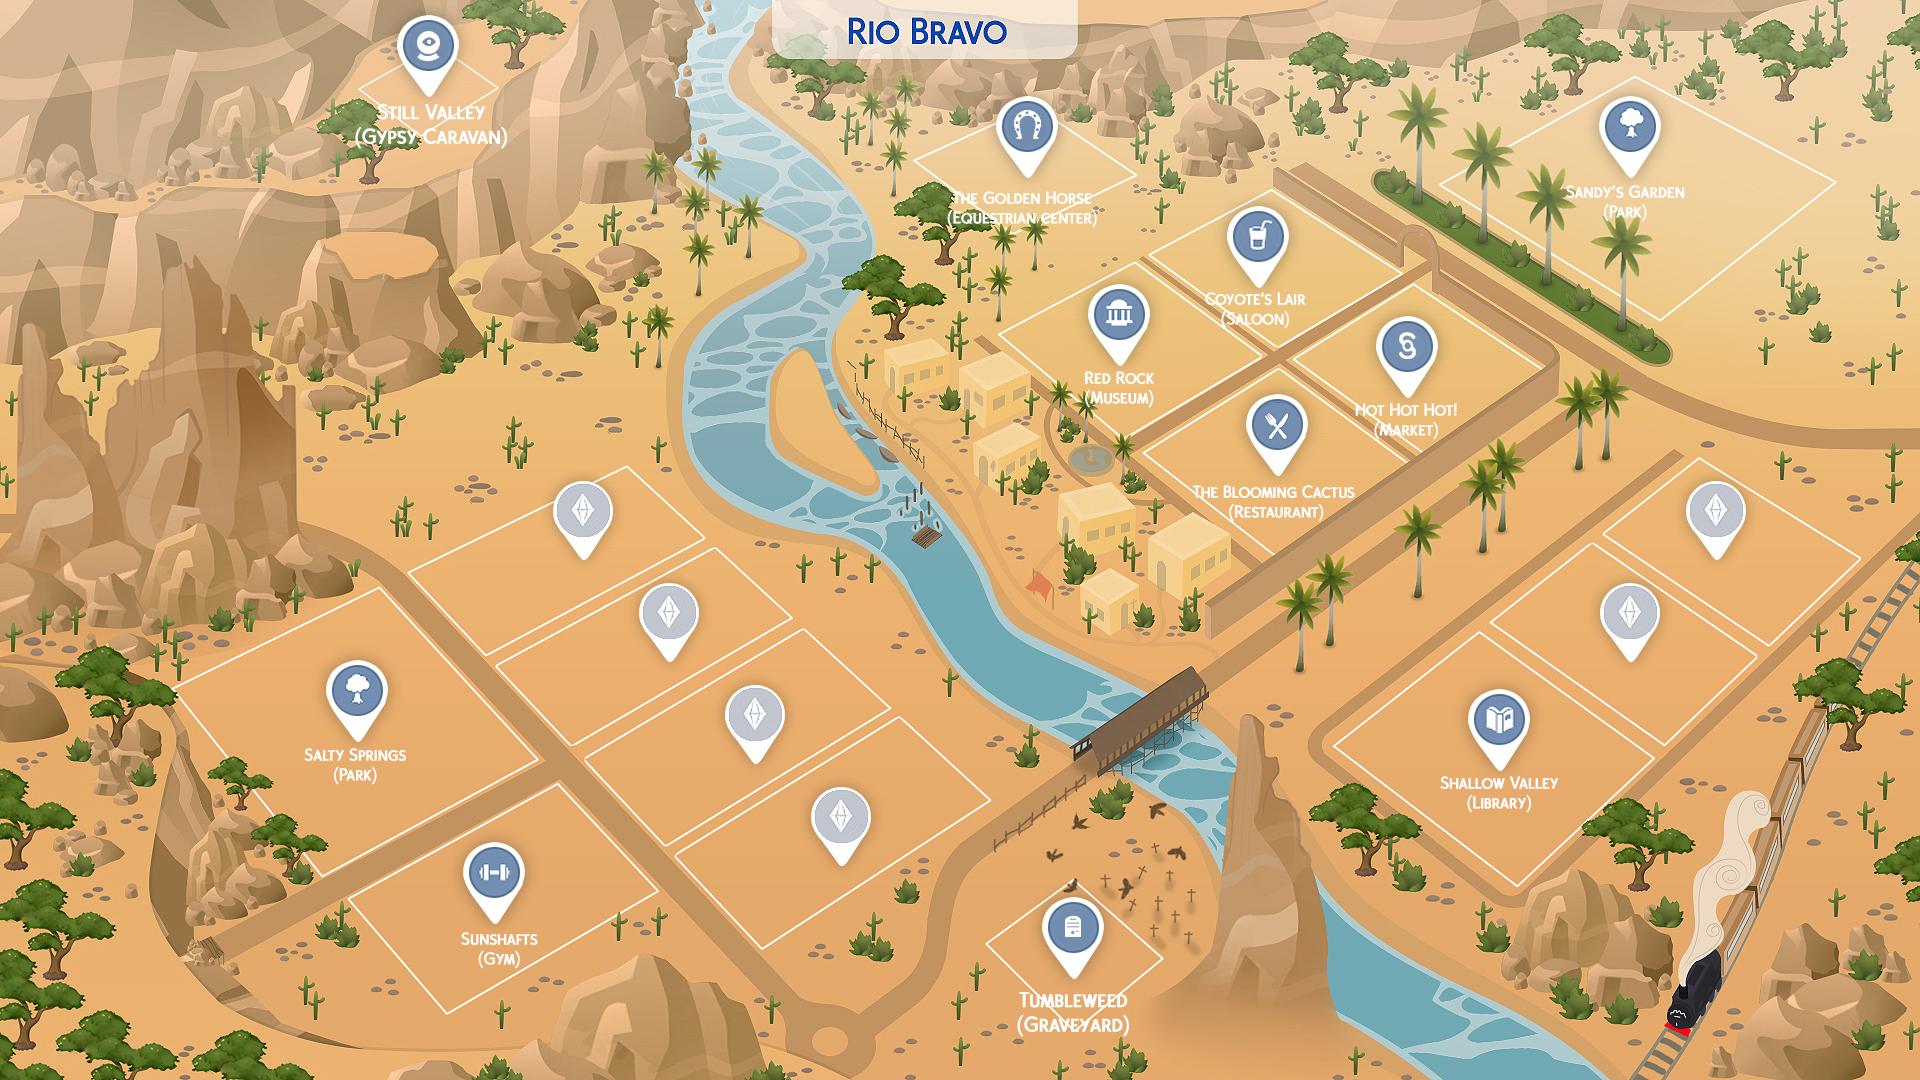 Filipesimss deviantart gallery filipesims 7 1 rio bravo sims 4 fanmade map by filipesims gumiabroncs Choice Image